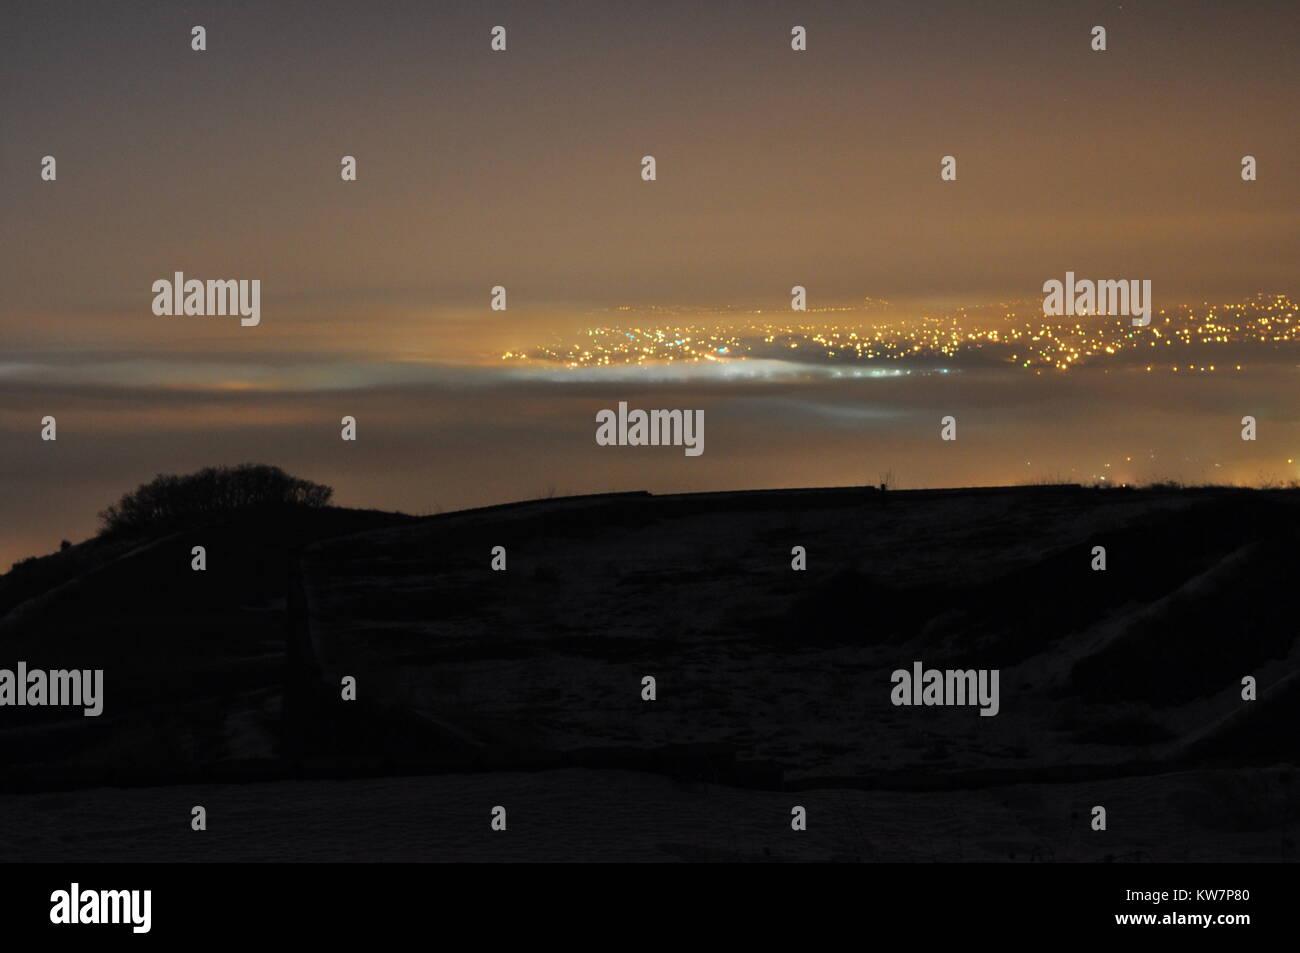 Winter Fogbank over Salt Lake City - Stock Image